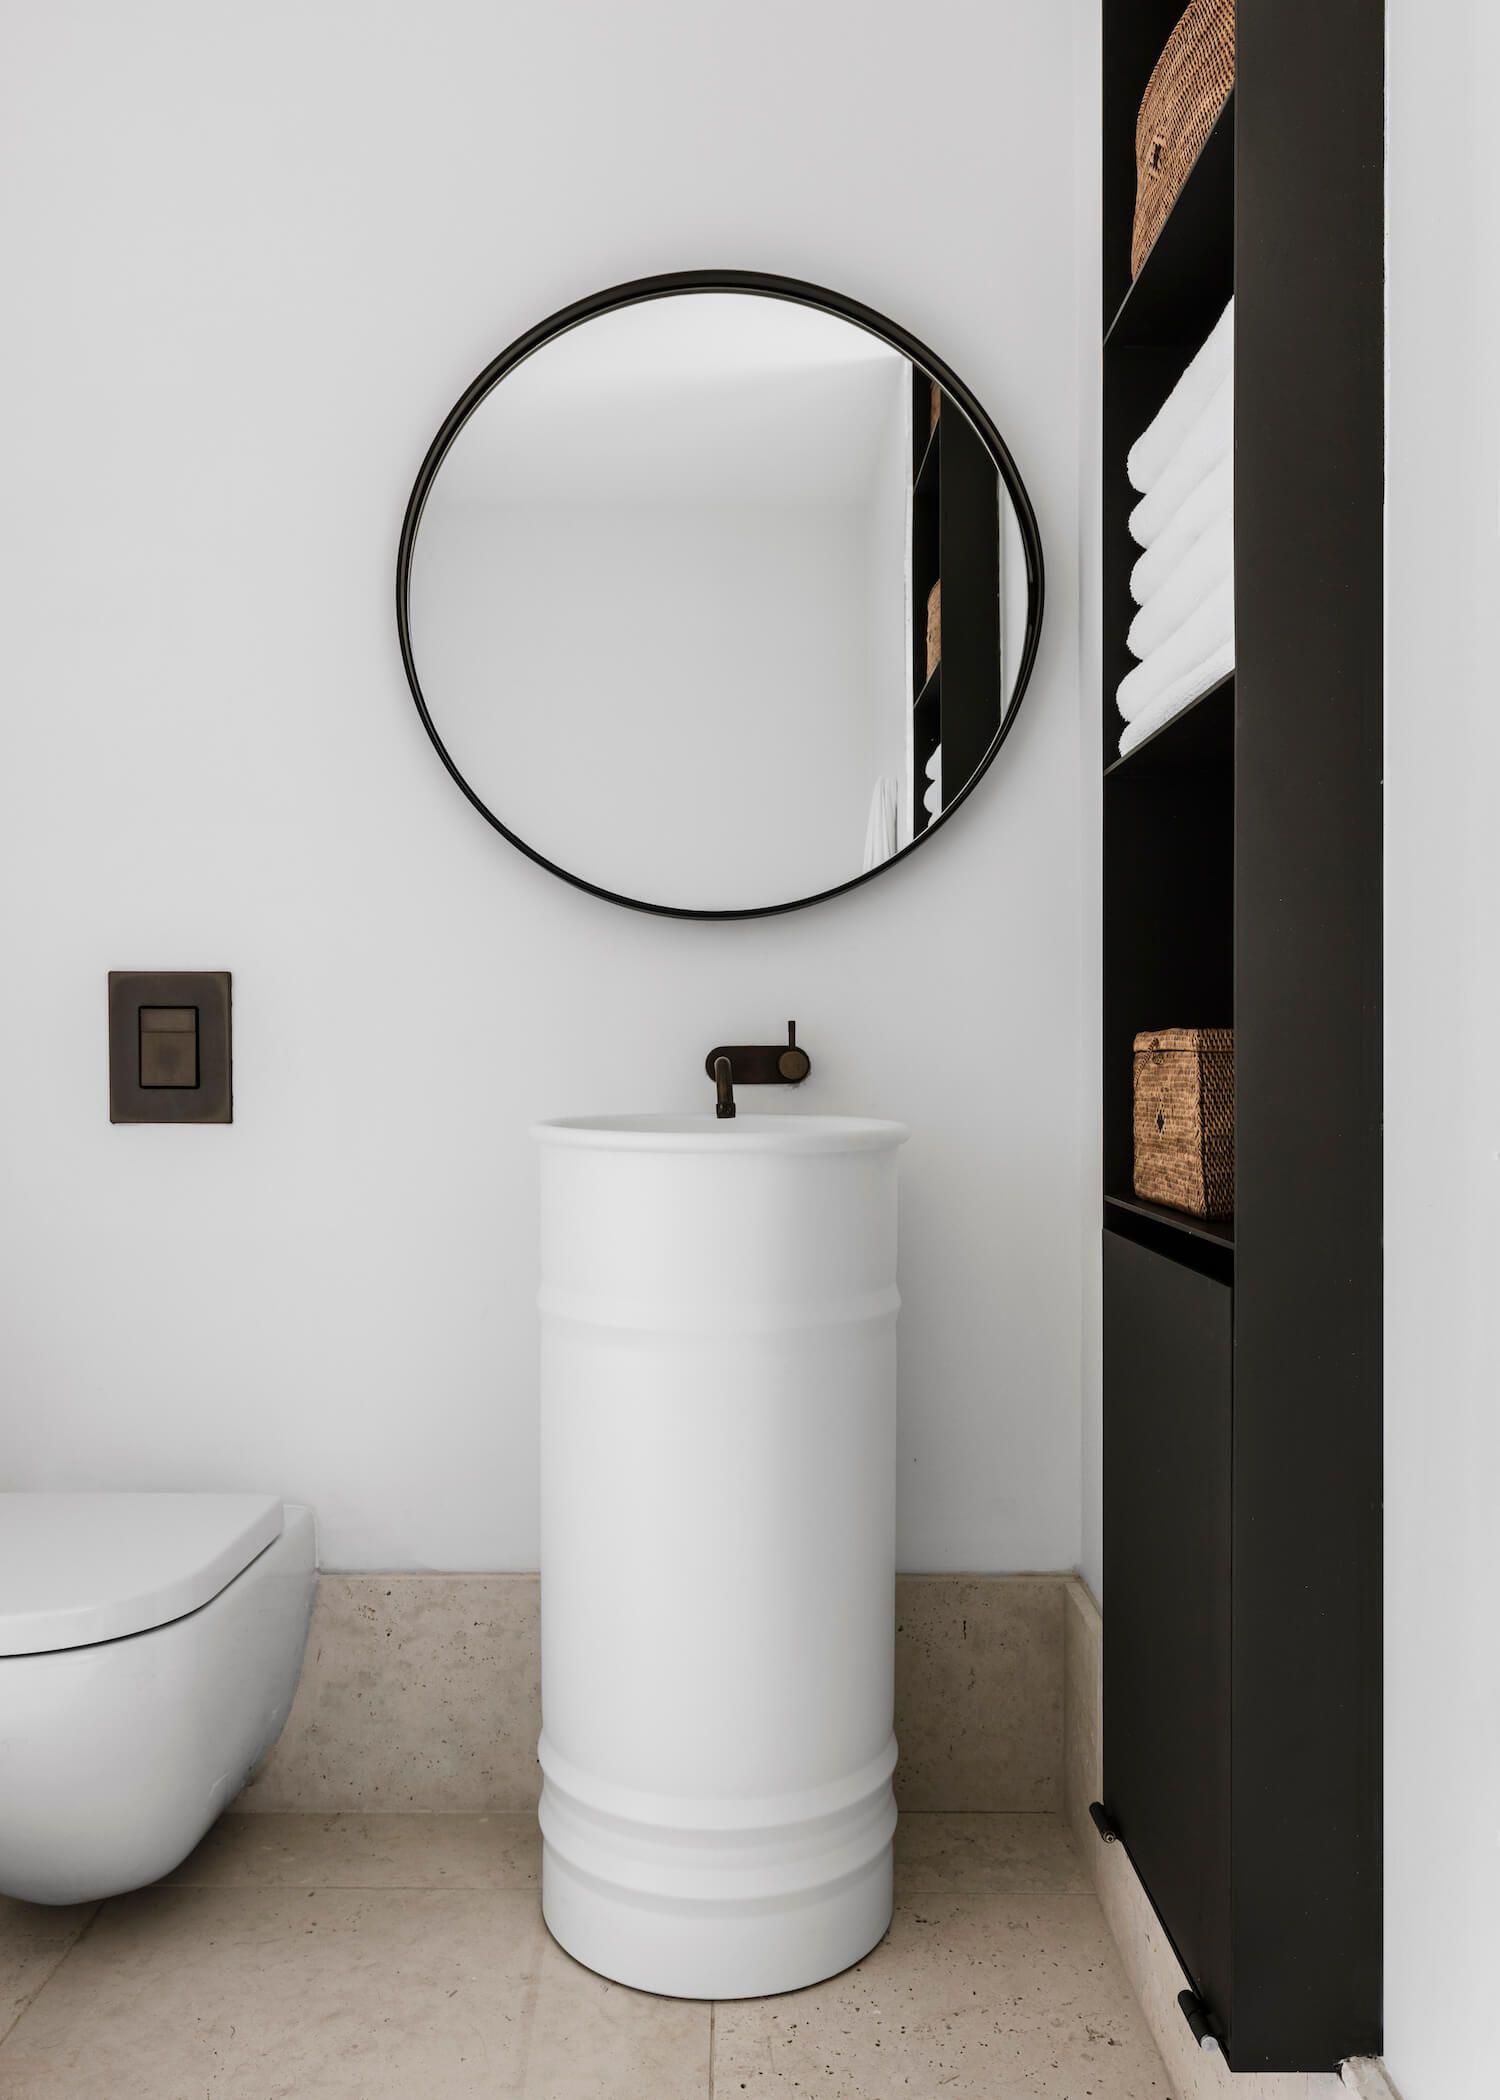 Interview: Handelsmann Khaw | Interior design studio, Interiors and ...